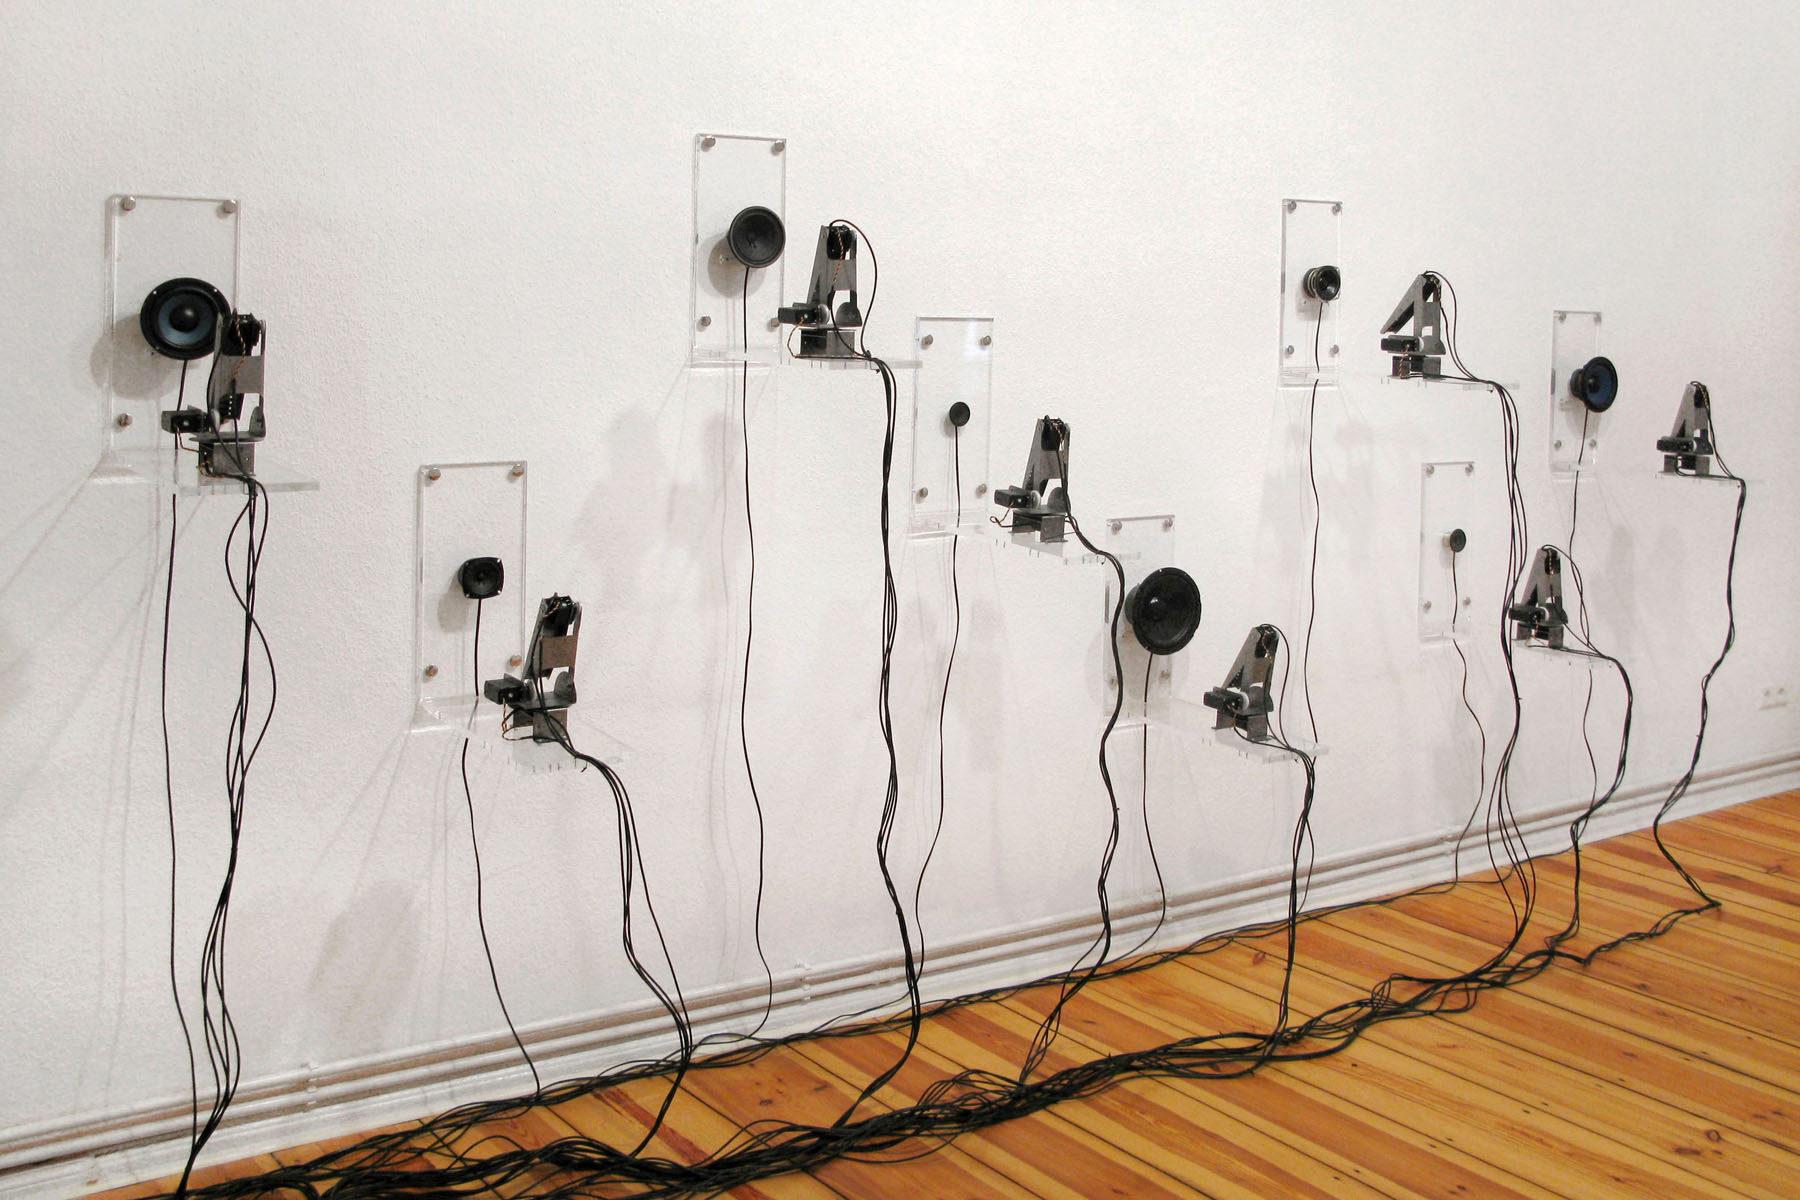 Roberto Pugliese, Equilibrium, 2011, installation view at Galerie Mario Mazzoli, Berlin